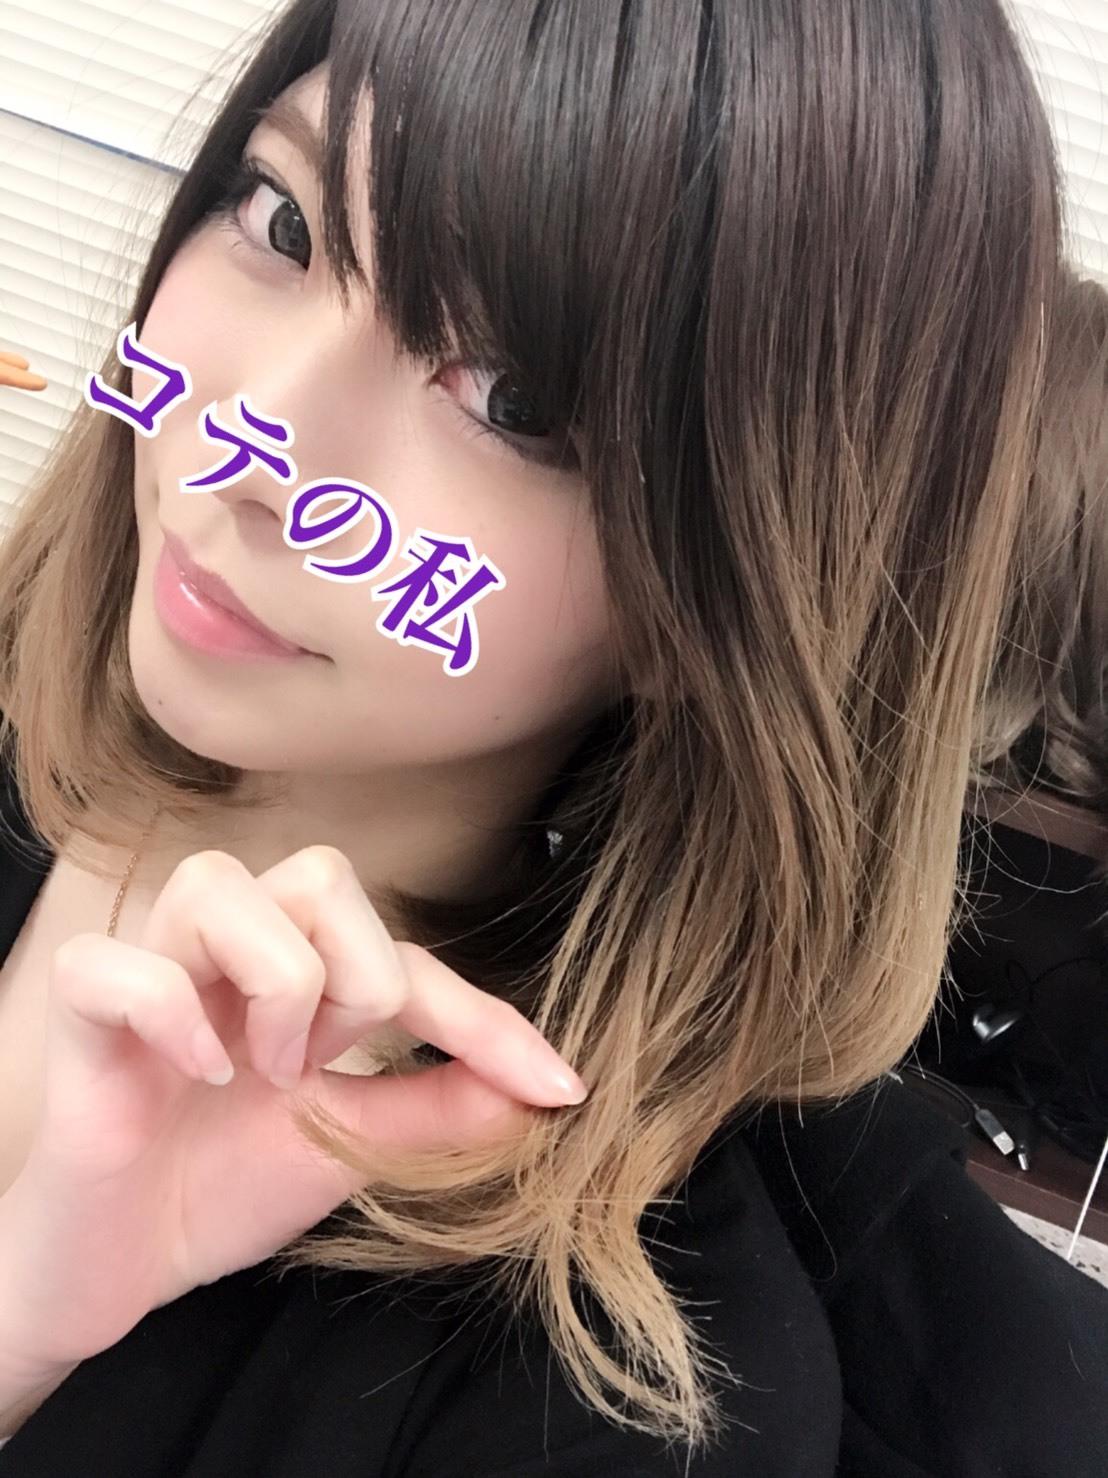 S__3391548.jpg